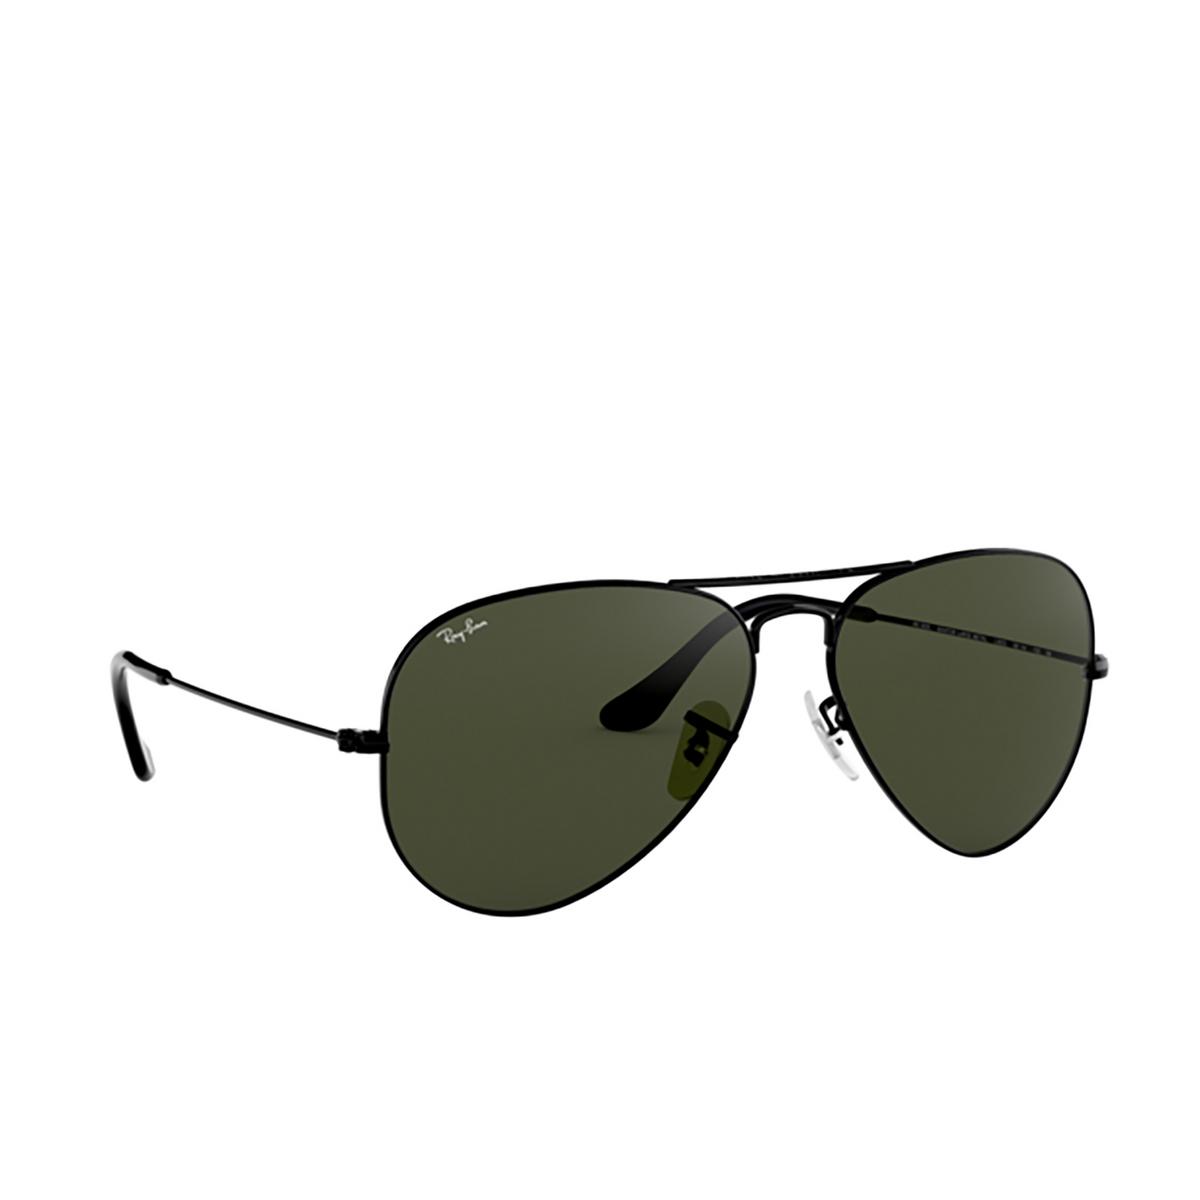 Ray-Ban® Aviator Sunglasses: Aviator Large Metal RB3025 color Black L2823.